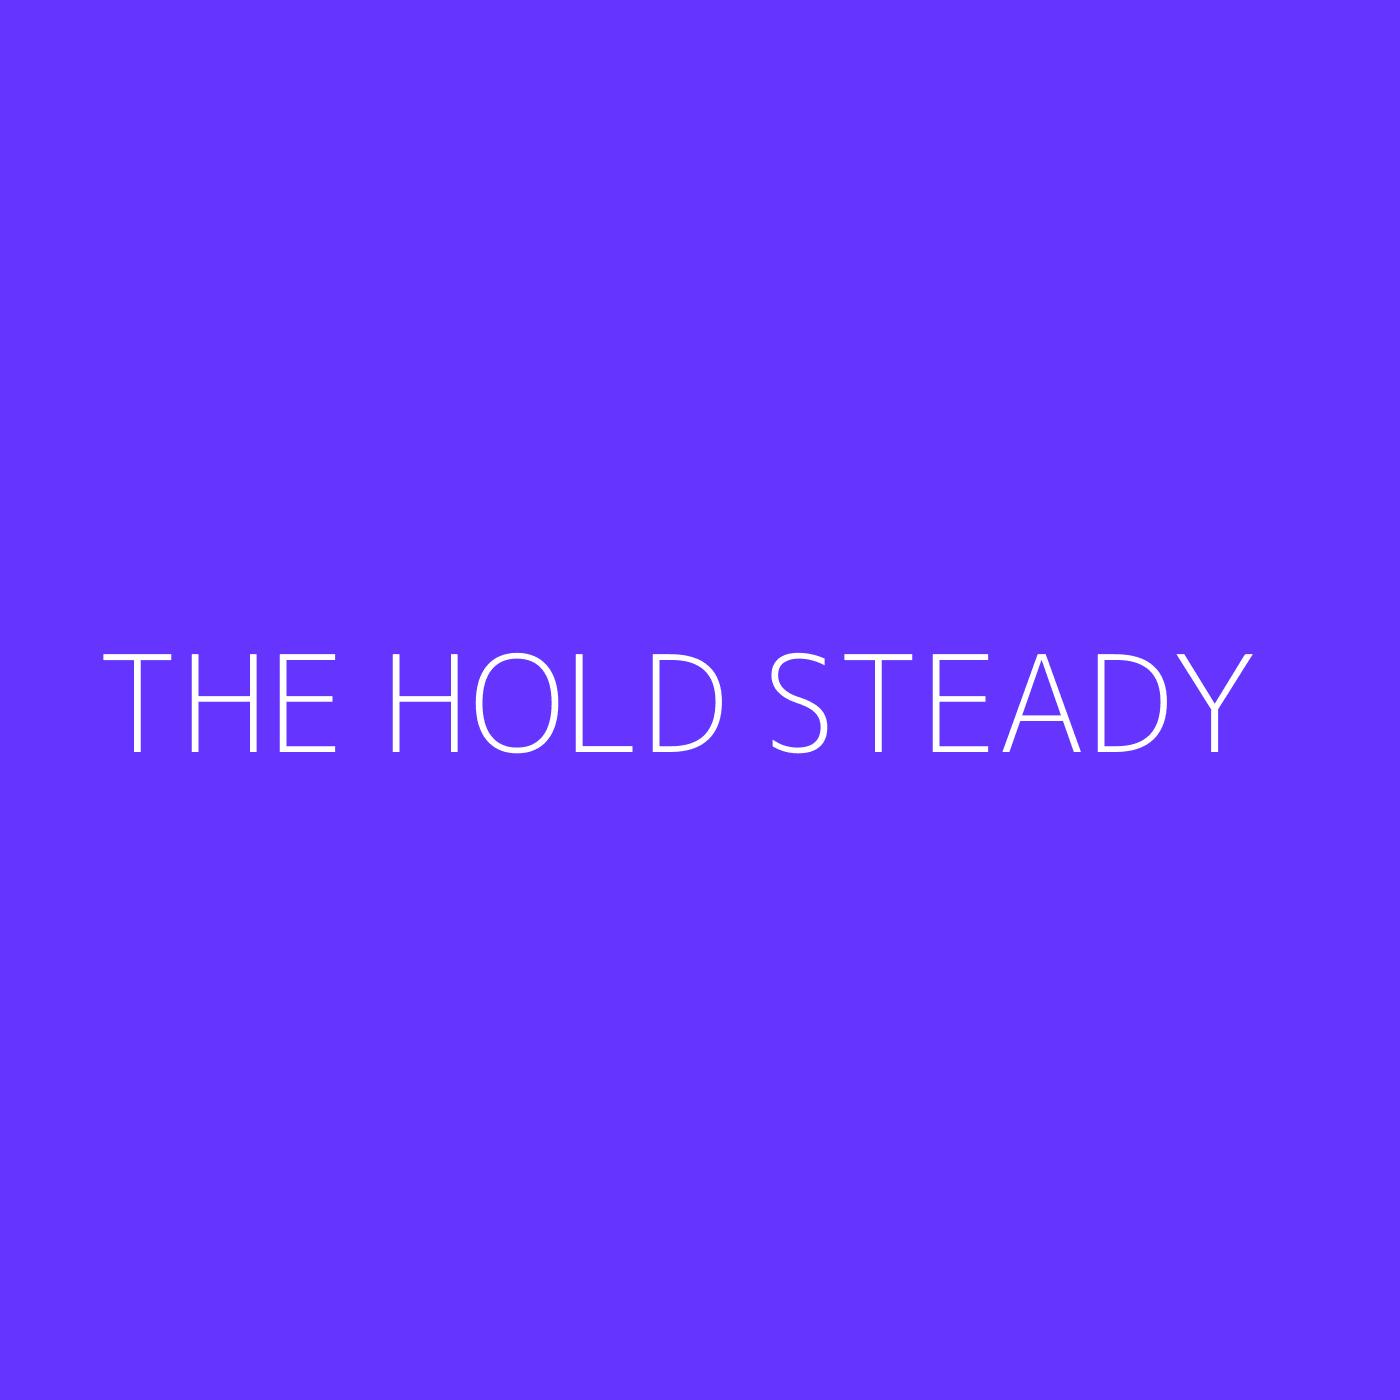 The Hold Steady Playlist Artwork